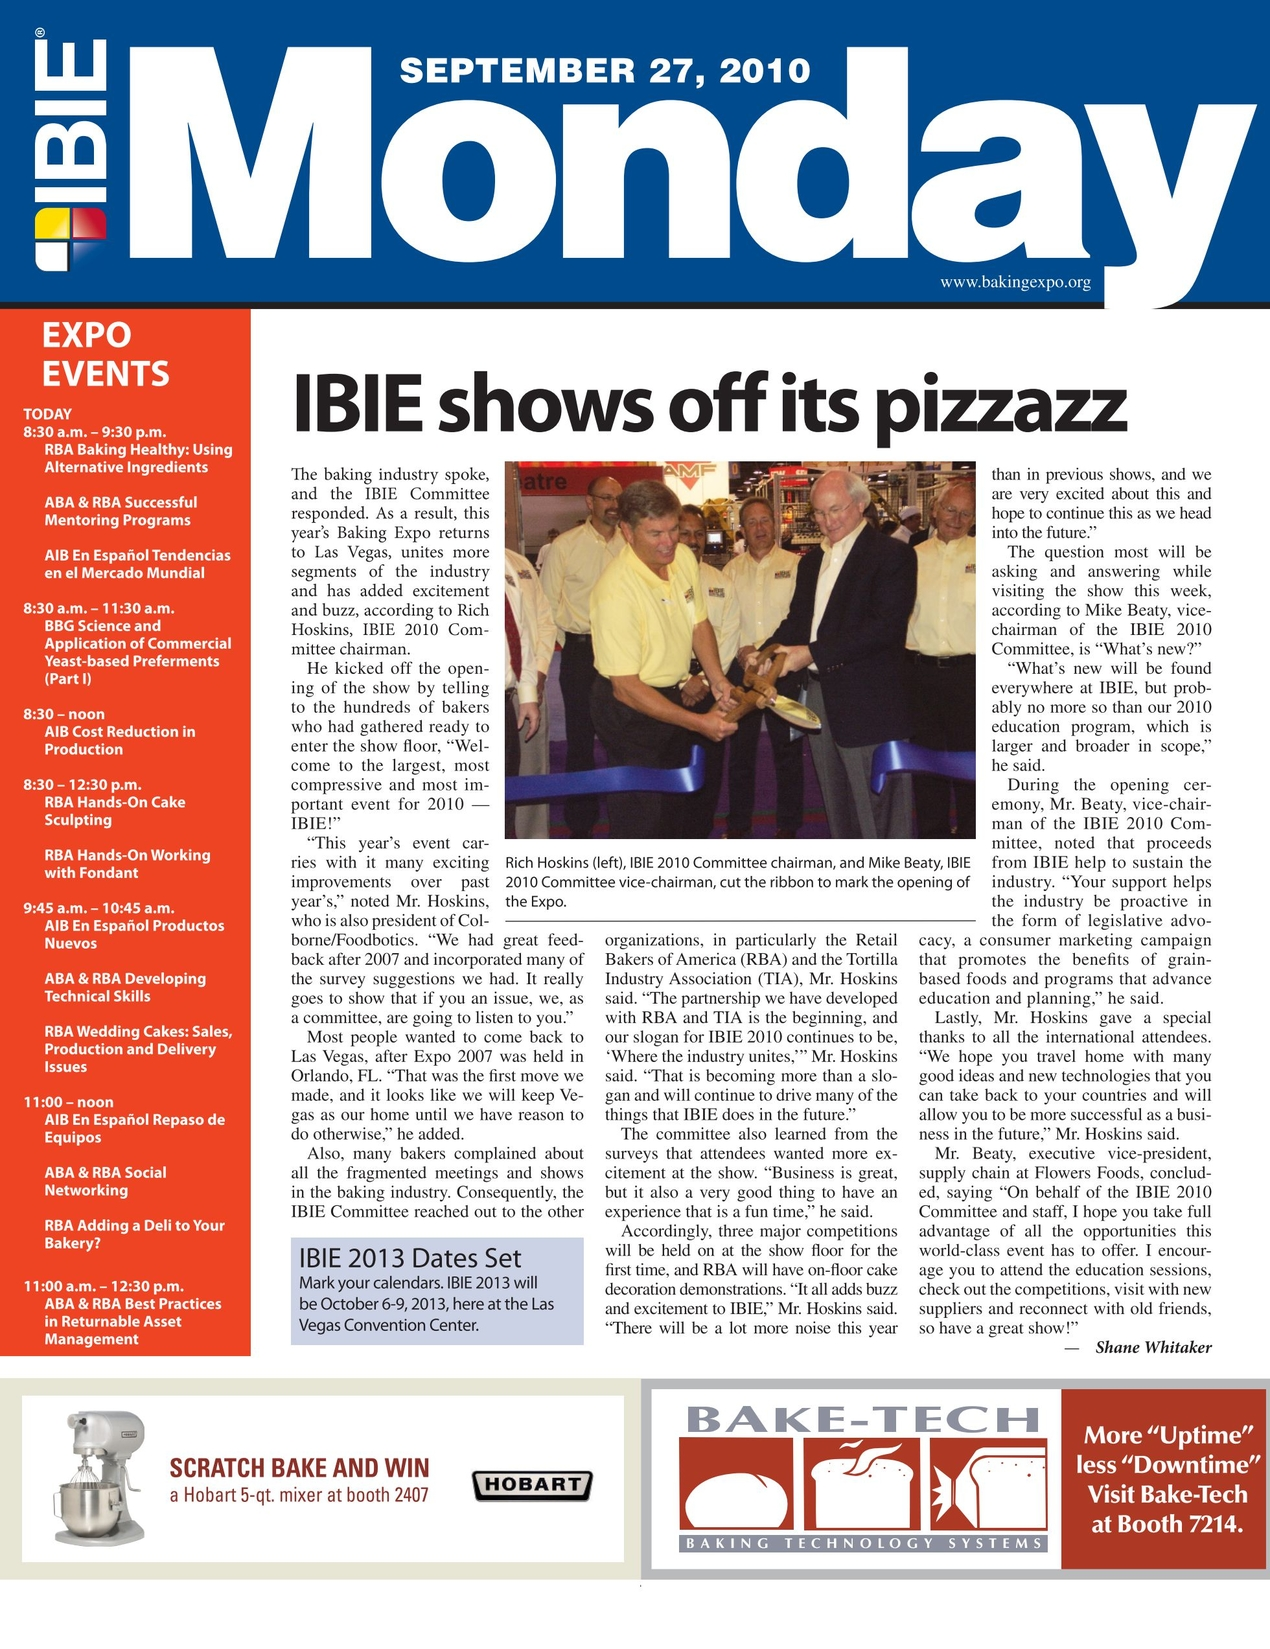 IBIE - September 27, 2010